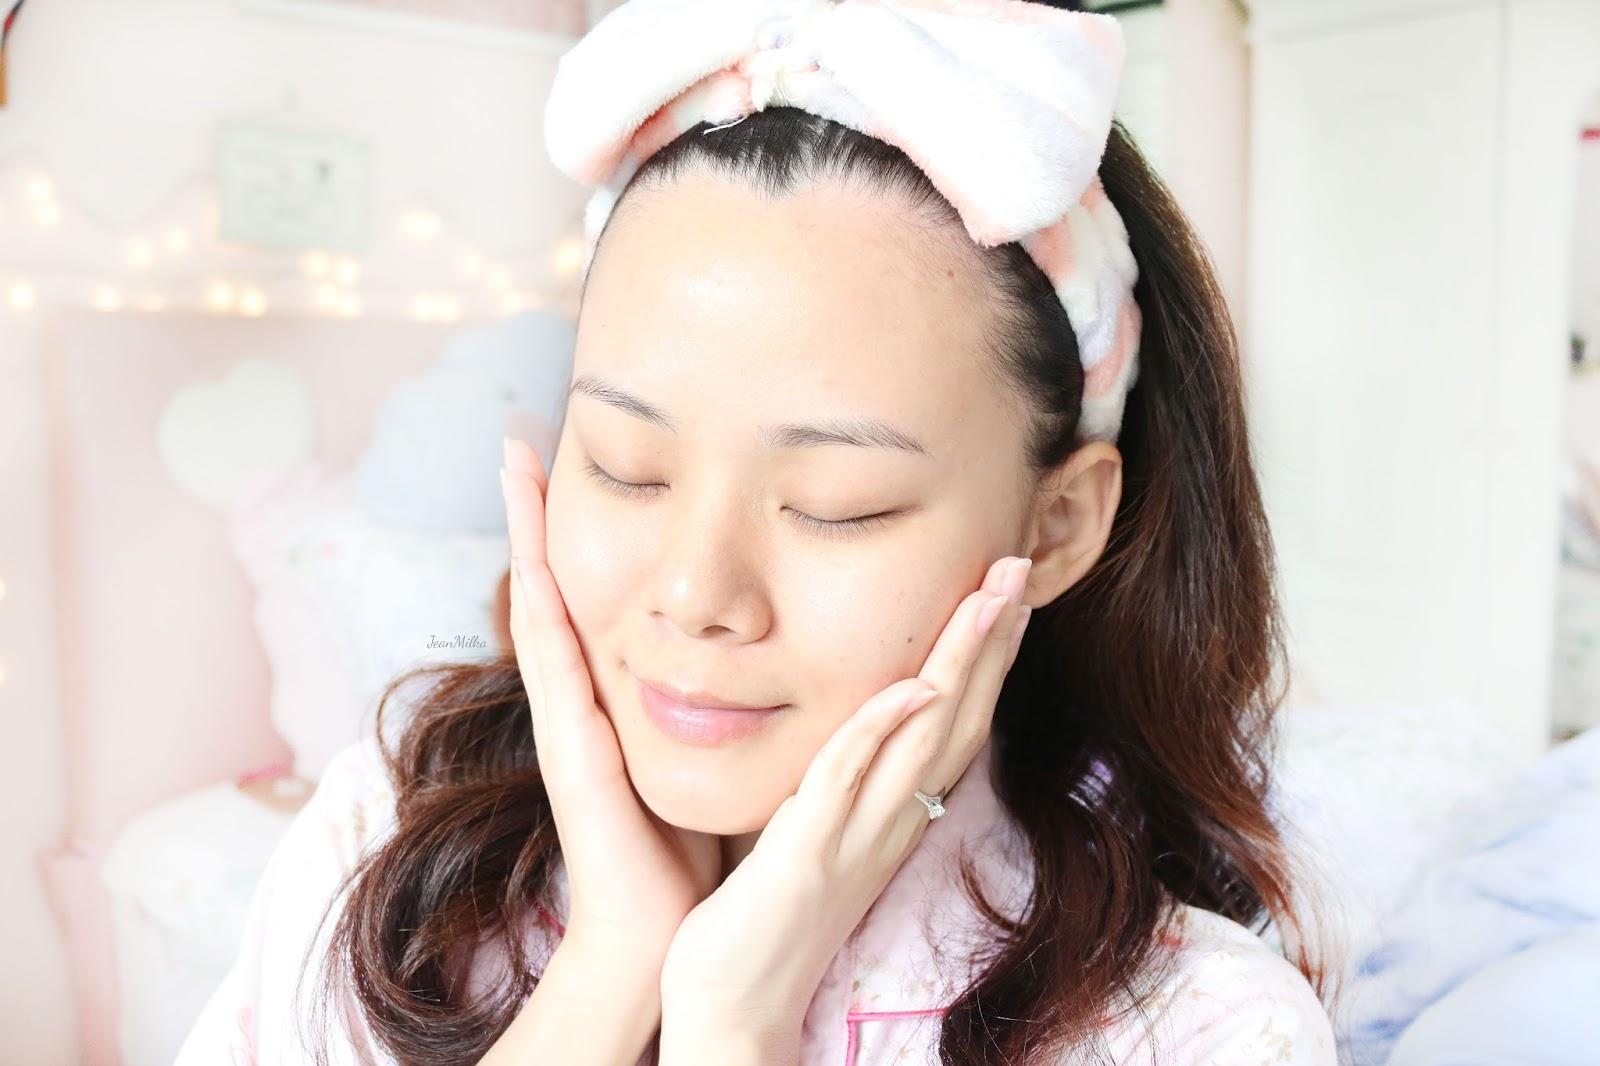 get unready, emina cosmetics, emina, produk indonesia, skincare, tips kulit berminyak, oily skin